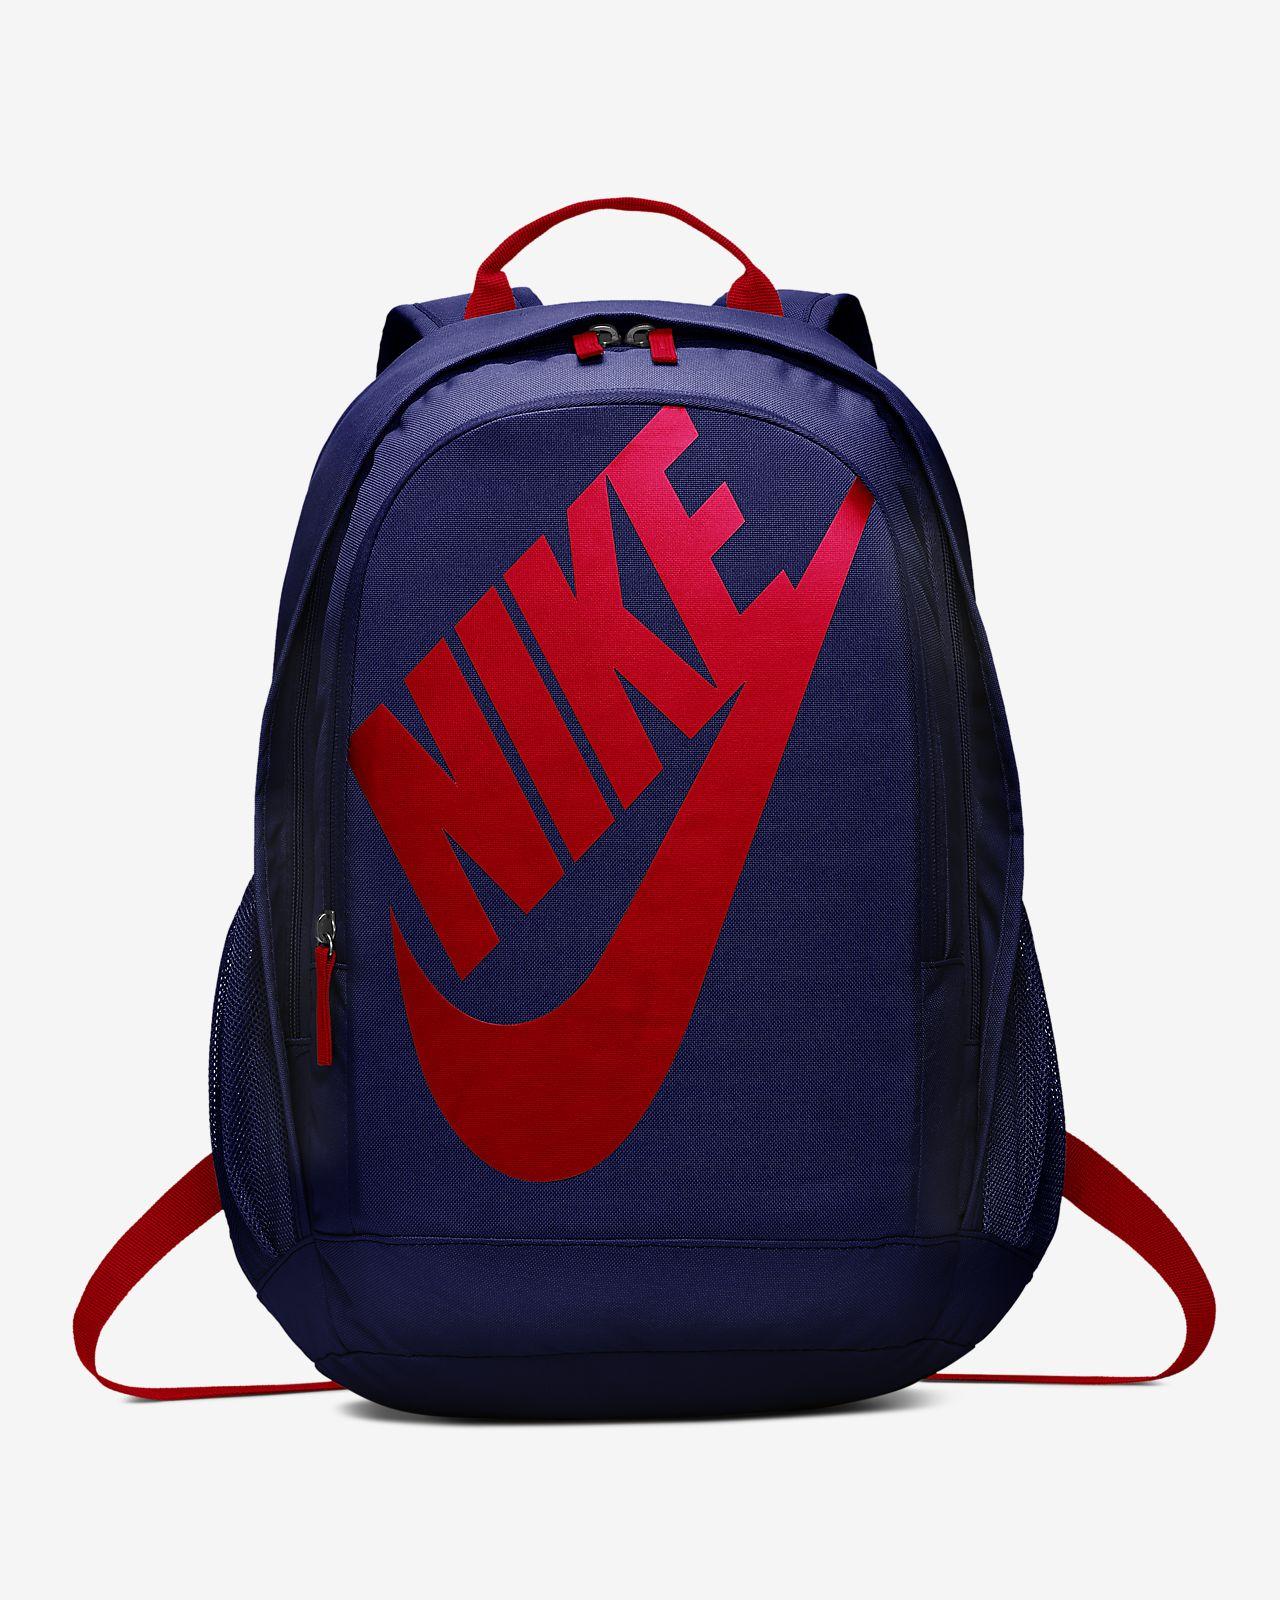 6d5e2019f7 Sac à dos Nike Sportswear Hayward Futura 2.0. Nike.com FR